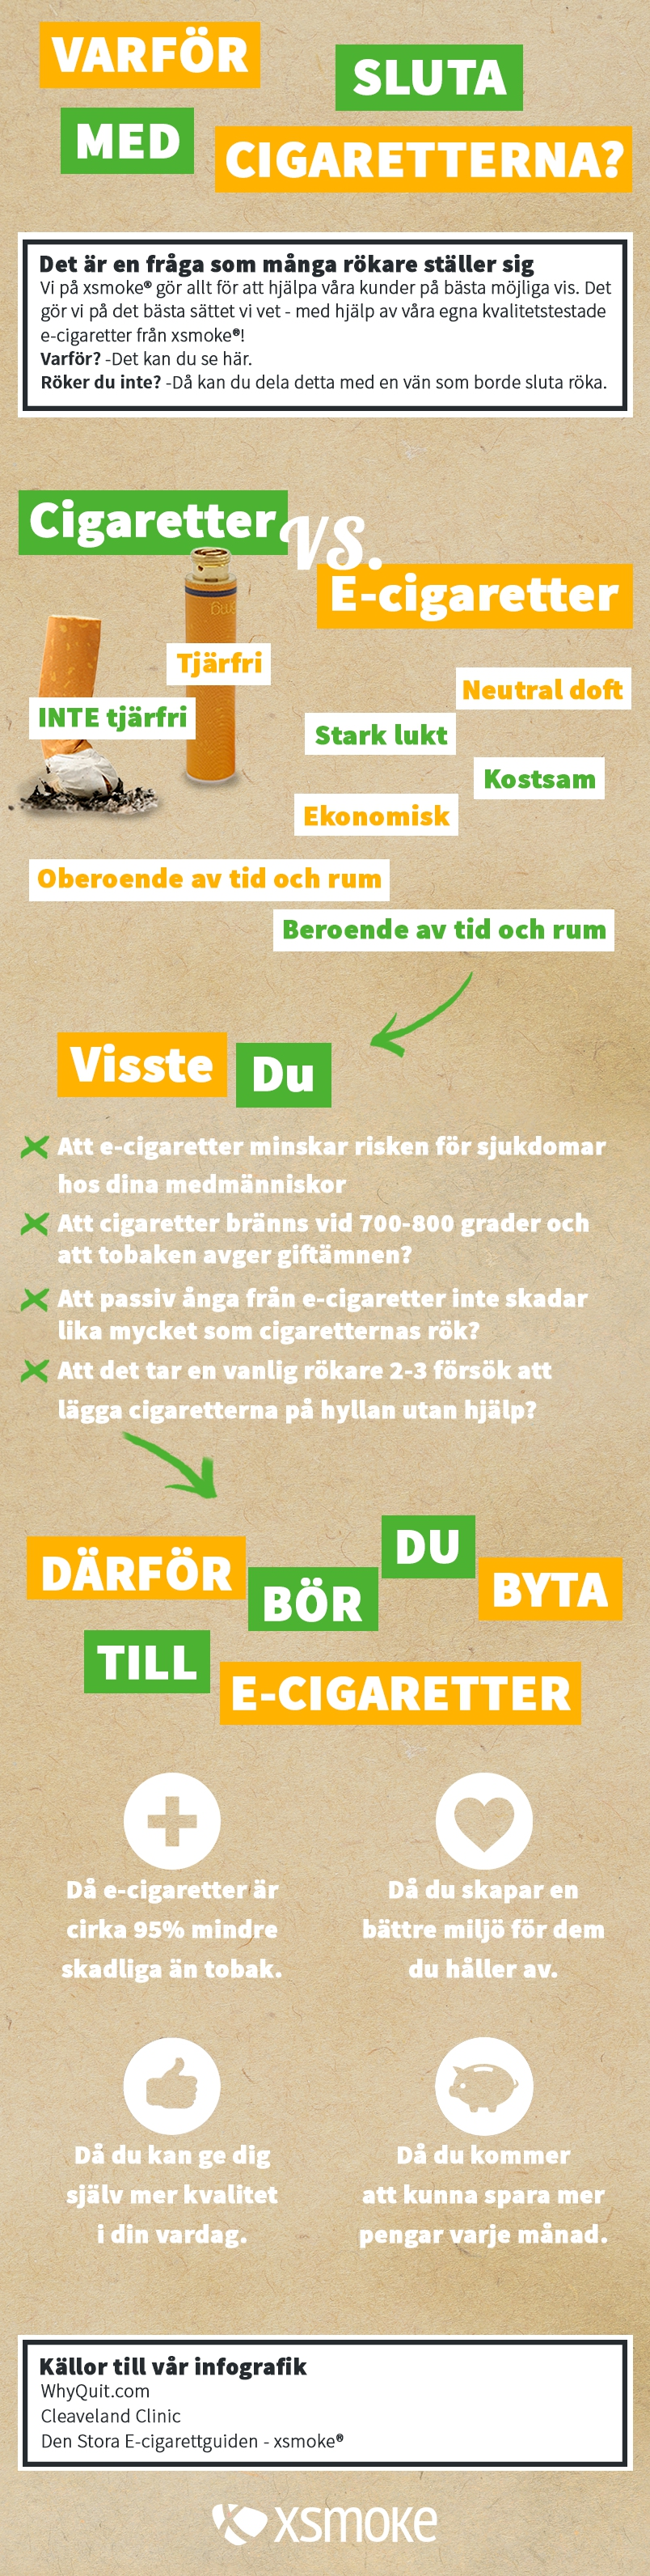 cigaretter vs e-cigaretter